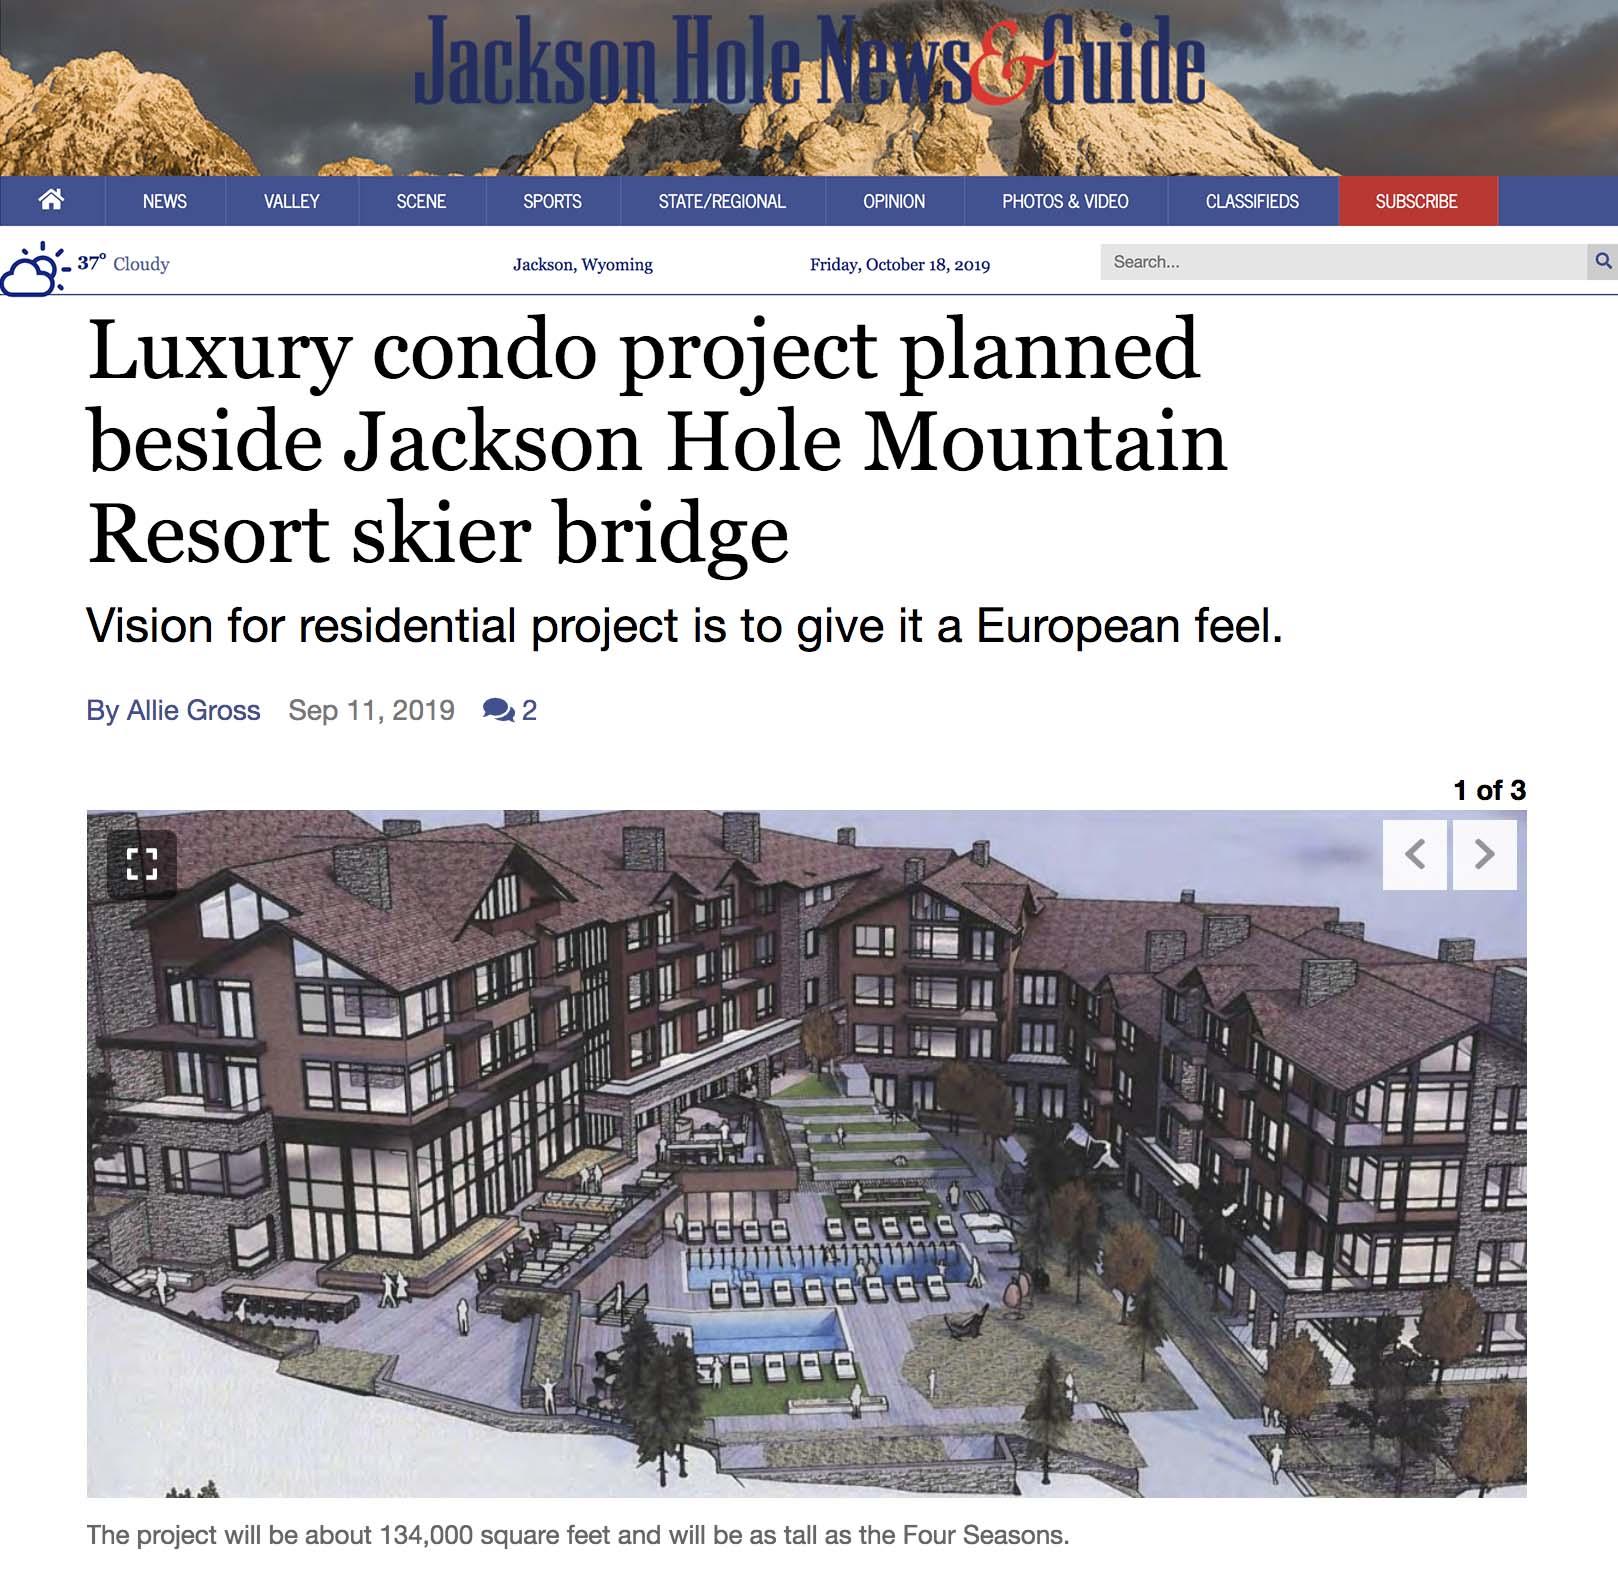 Luxury condo project planned beside Jackson Hole Mountain Resort skier bridge